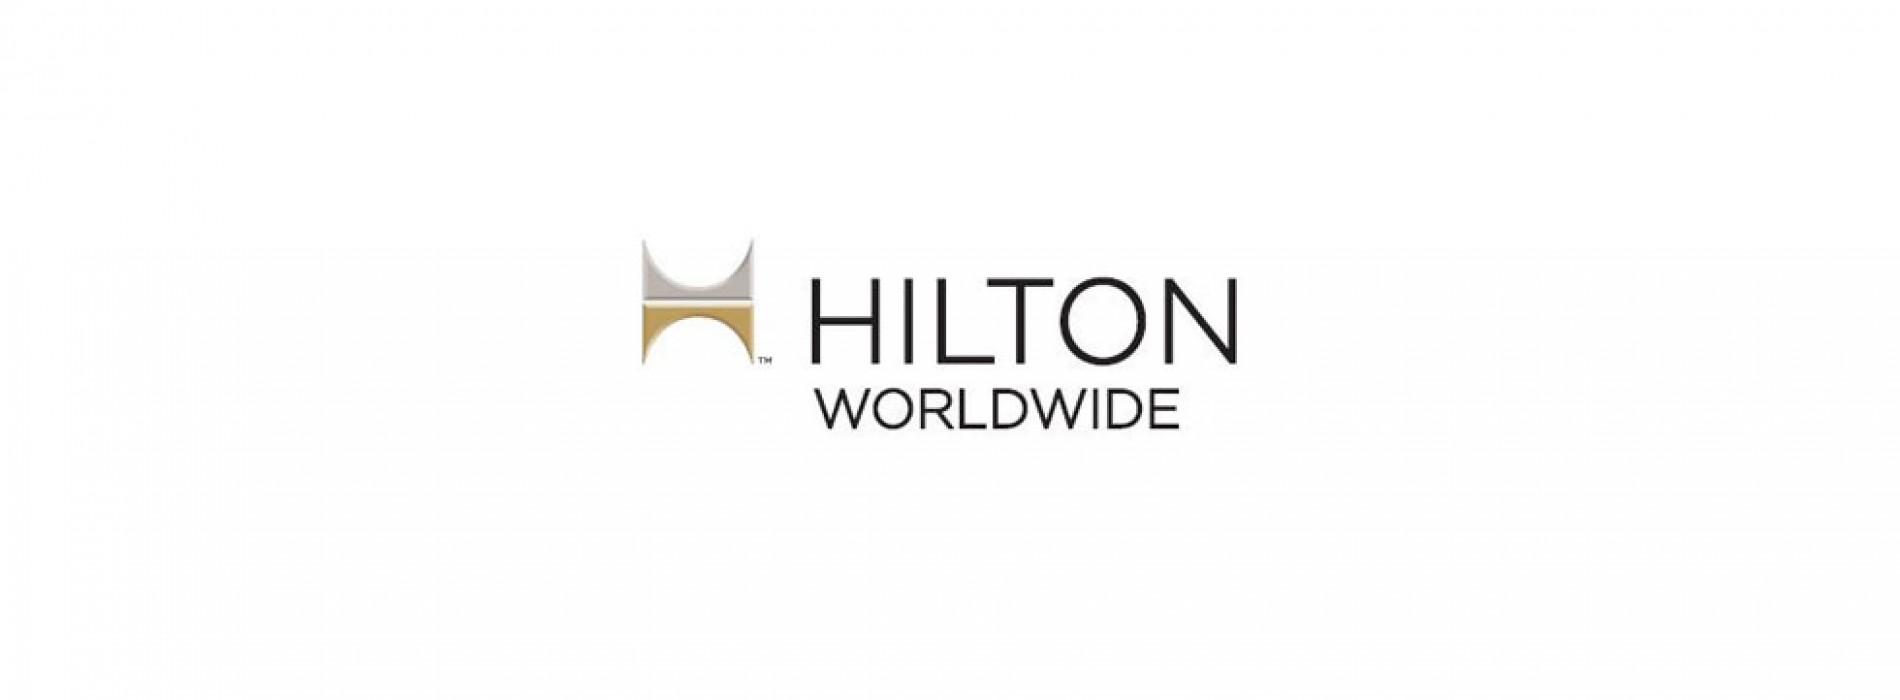 Hilton Worldwide 2016 India showcases a resounding success